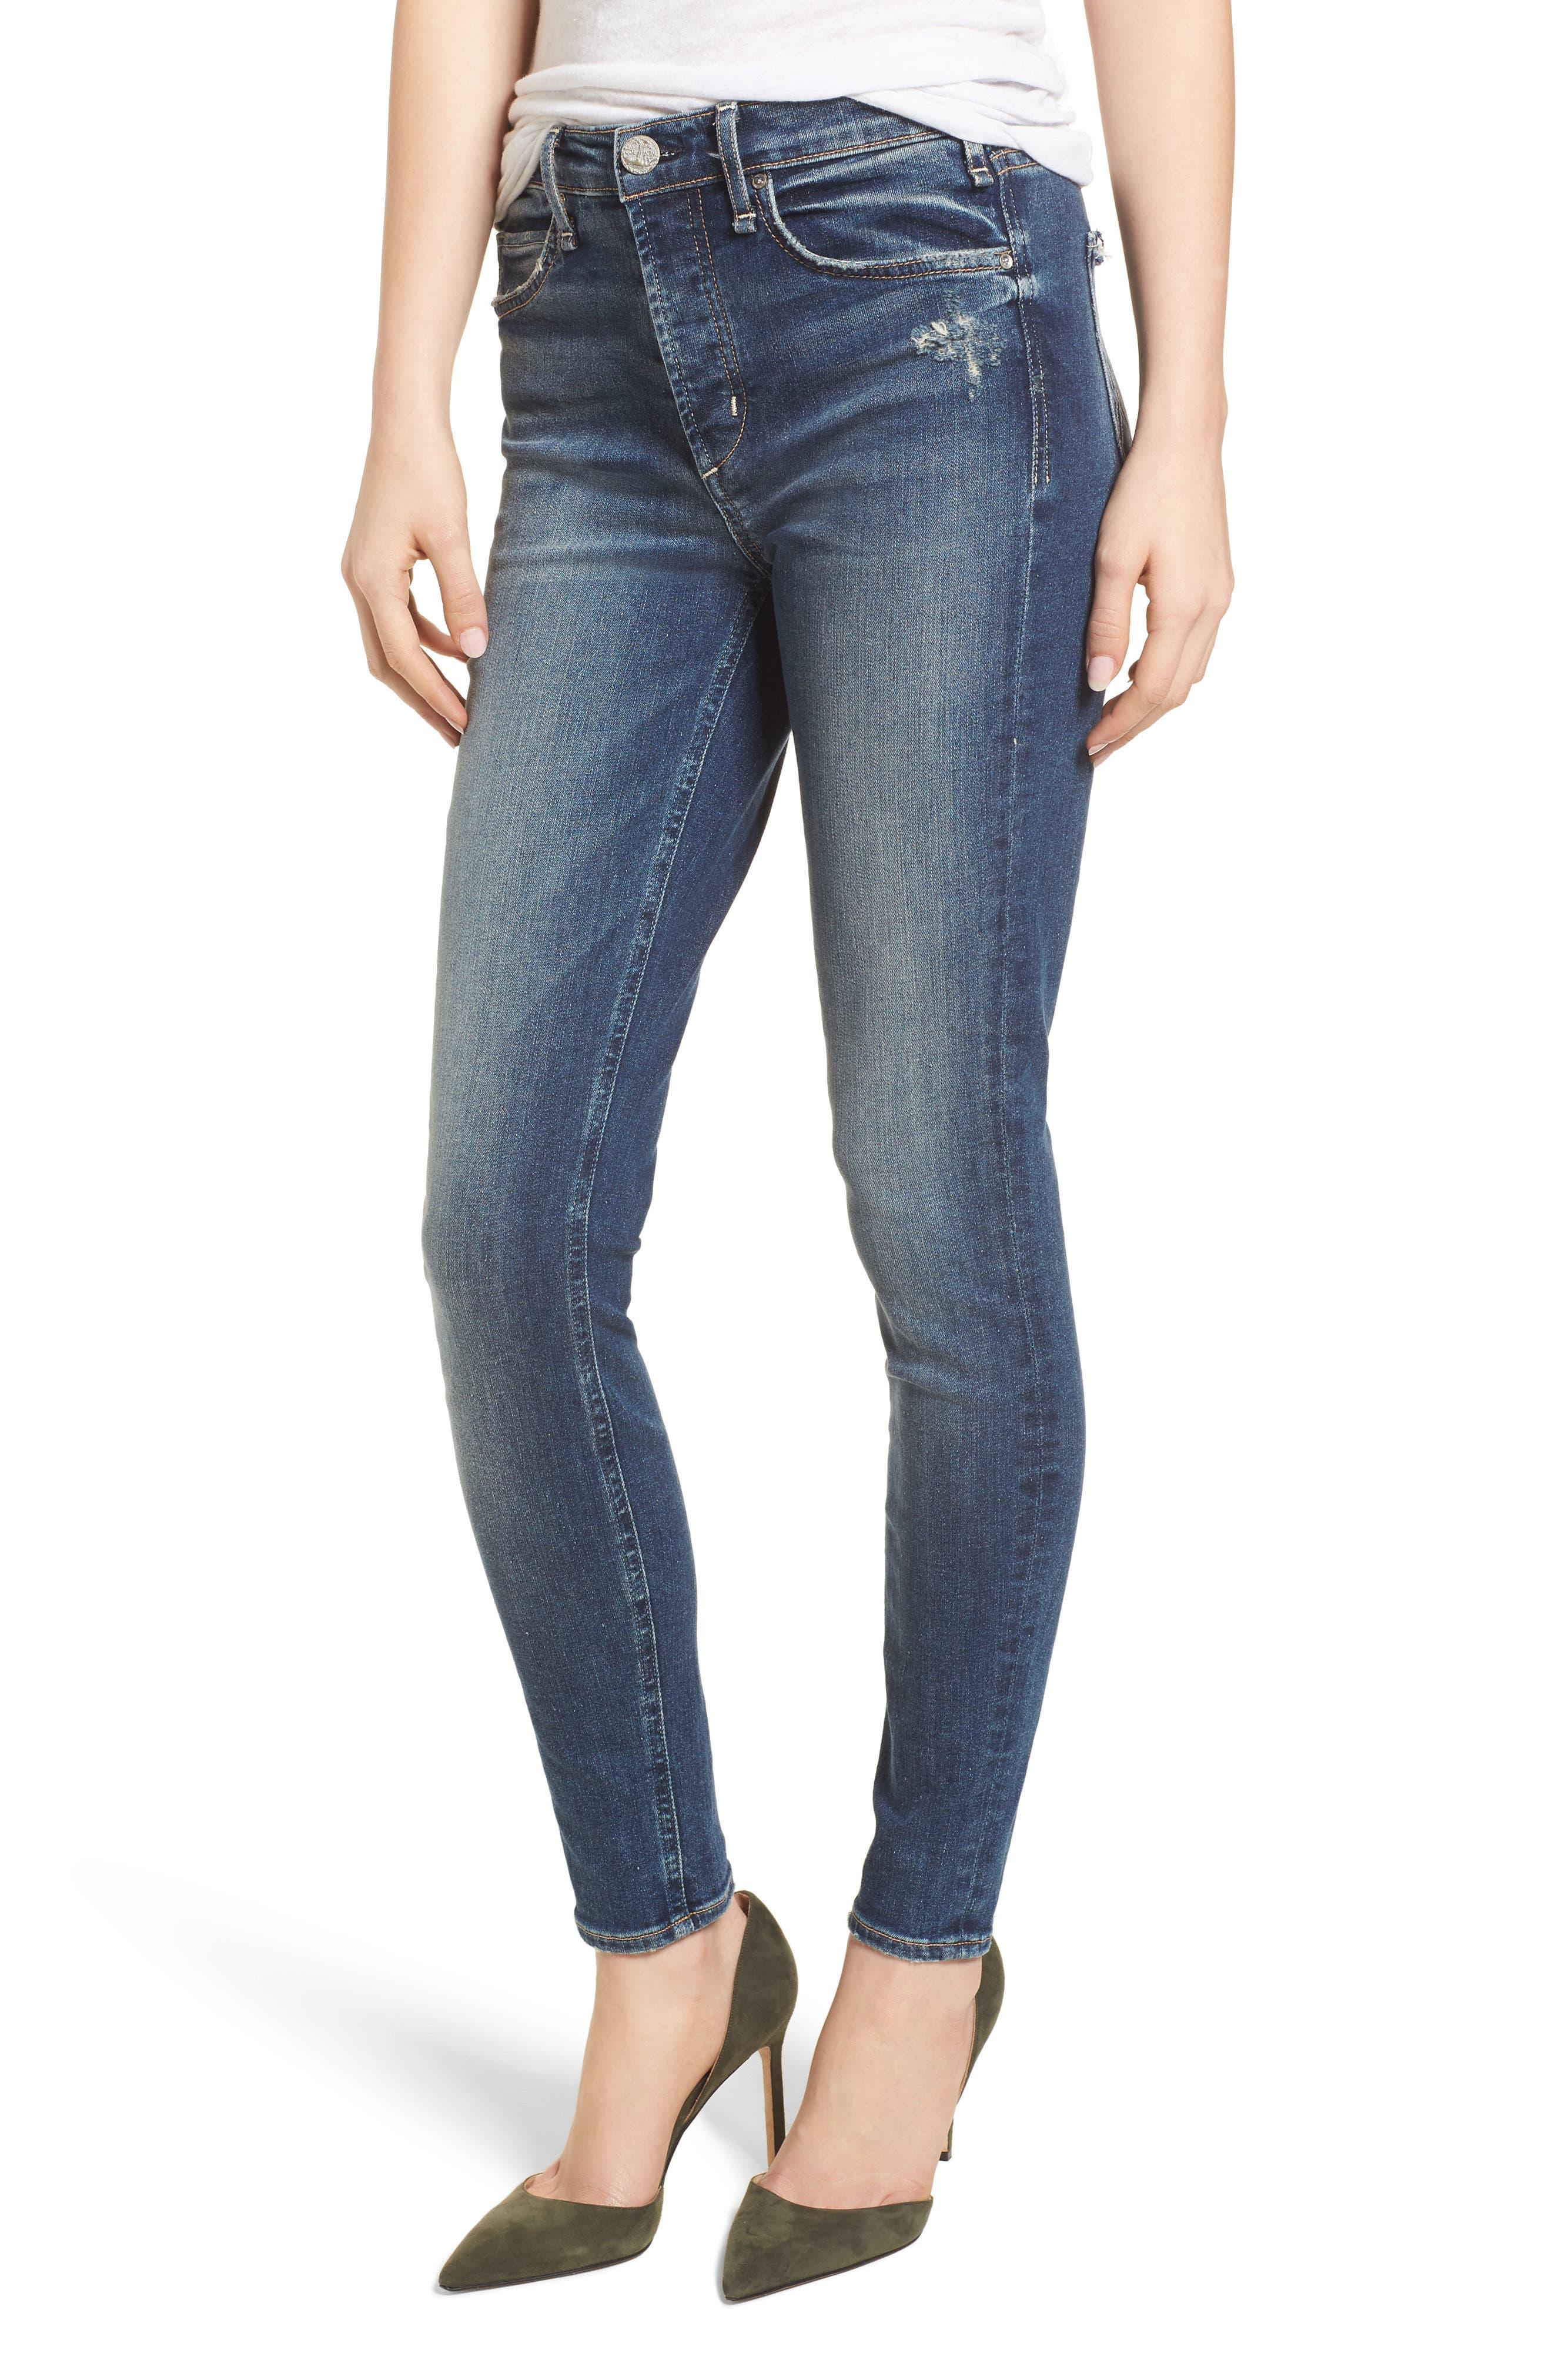 McGuire Newton High Rise Skinny Jeans (Smapaio)